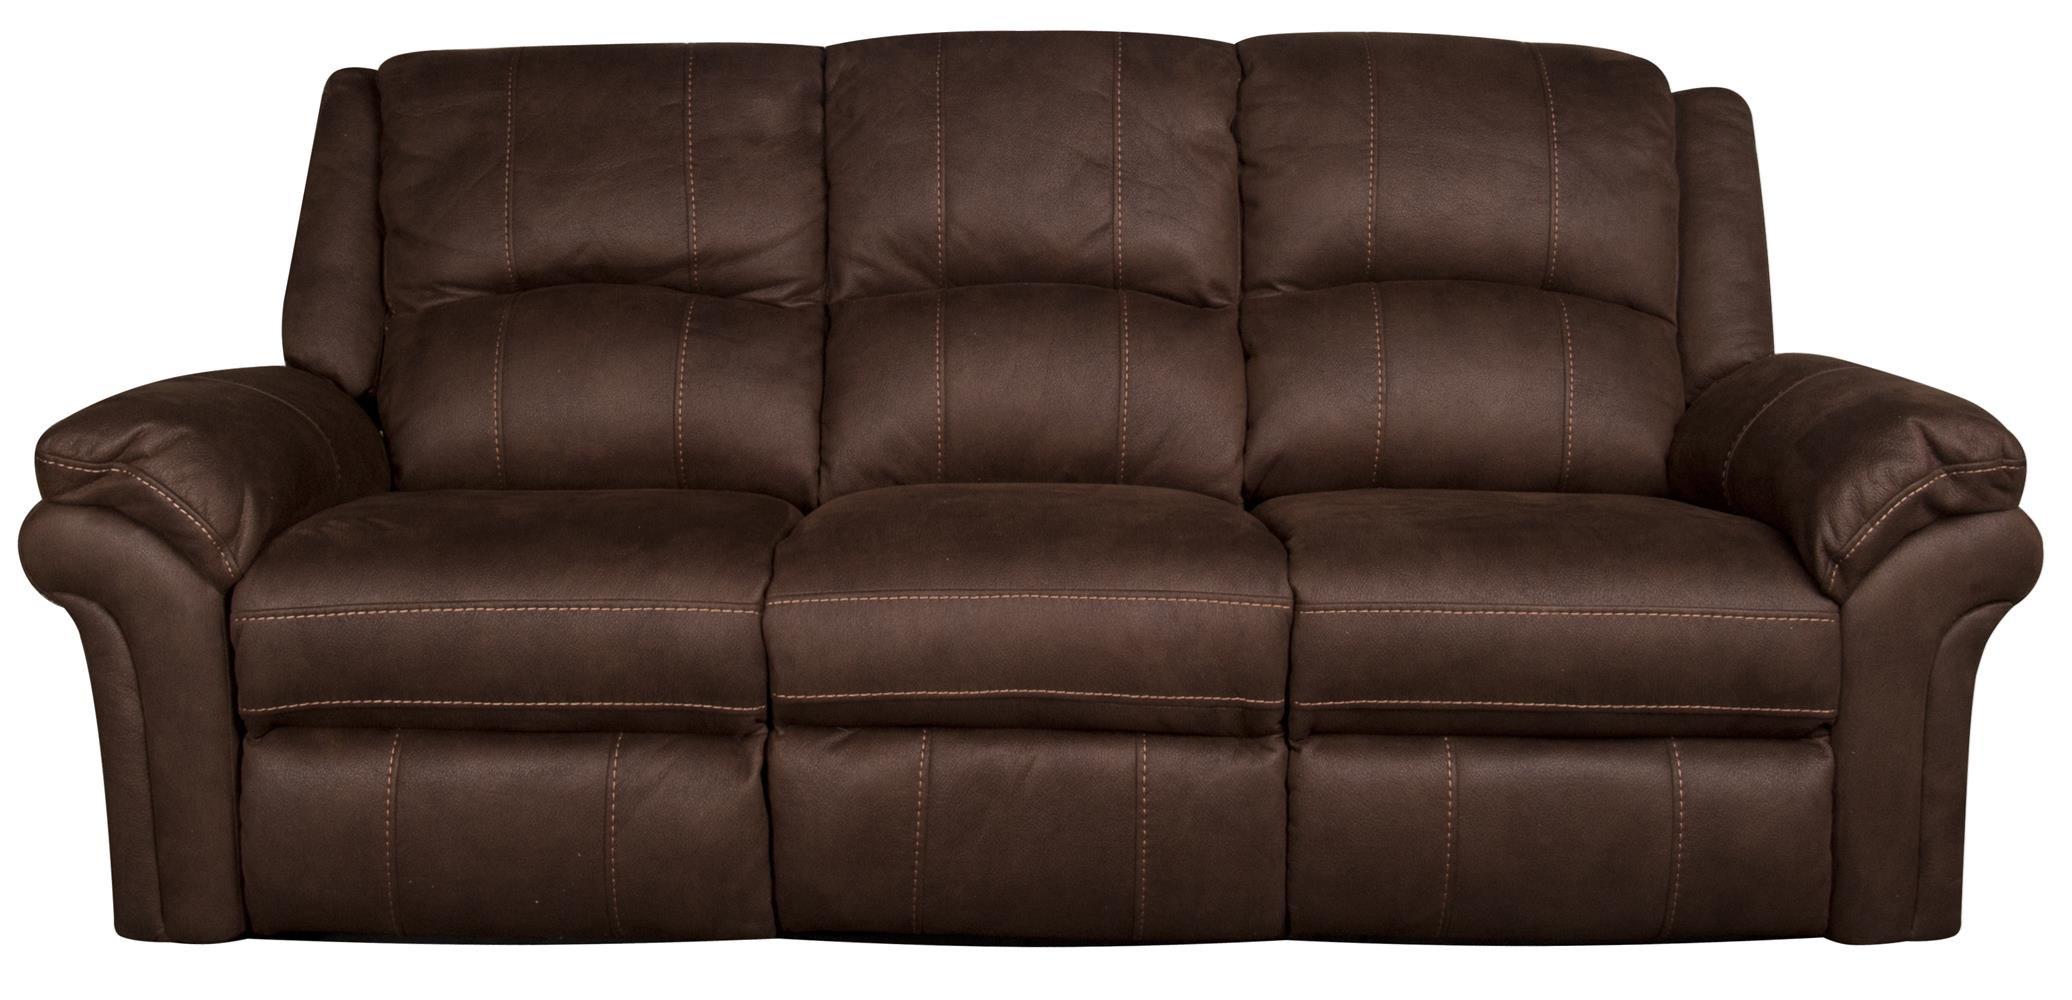 Morris Home Gary Gary Reclining Sofa - Item Number: 102837511